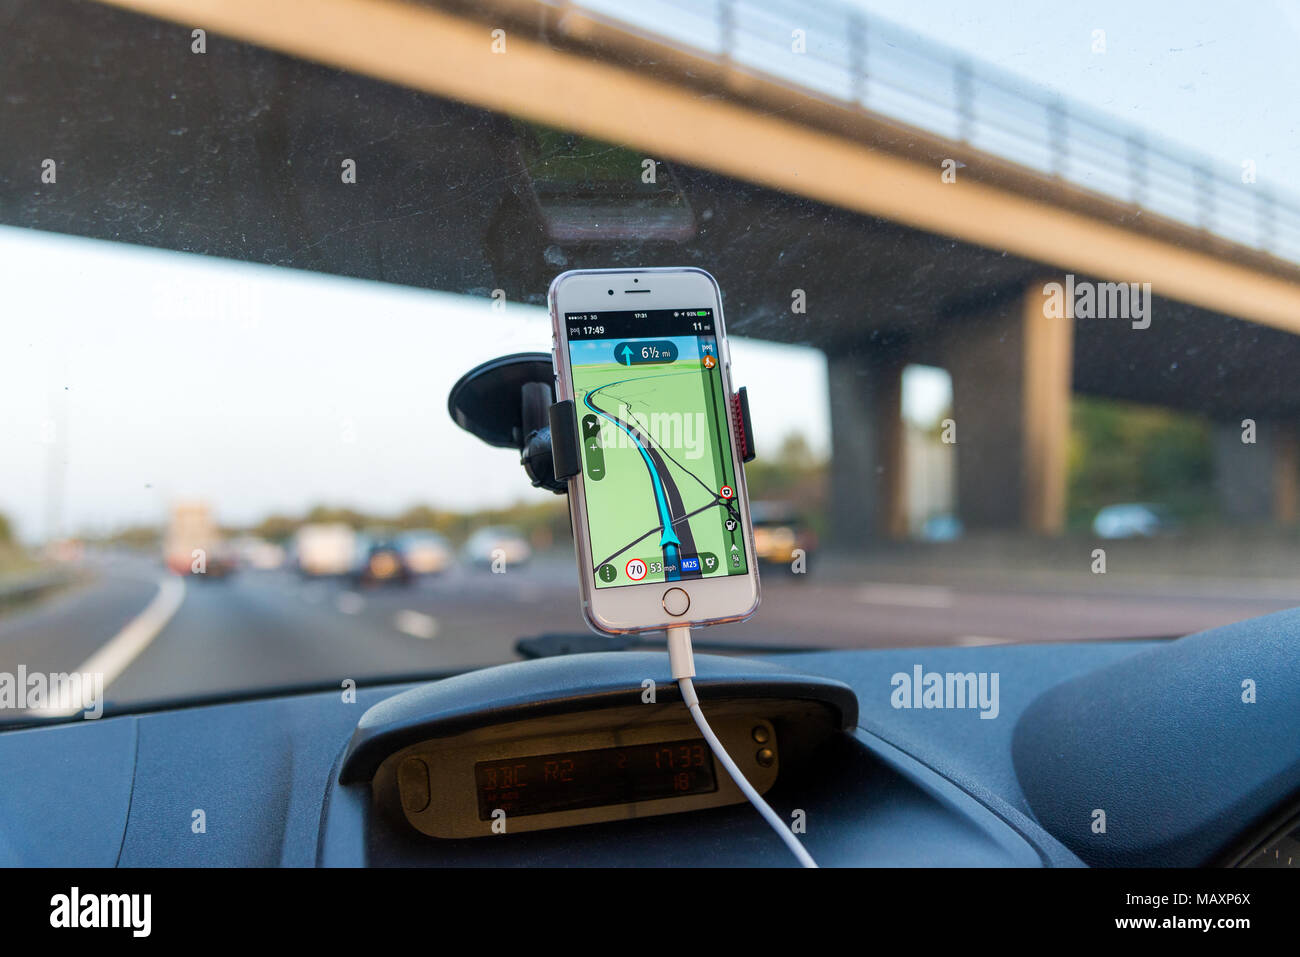 Using TomTom satnav app on iPhone while driving on motorway, UK - Stock Image